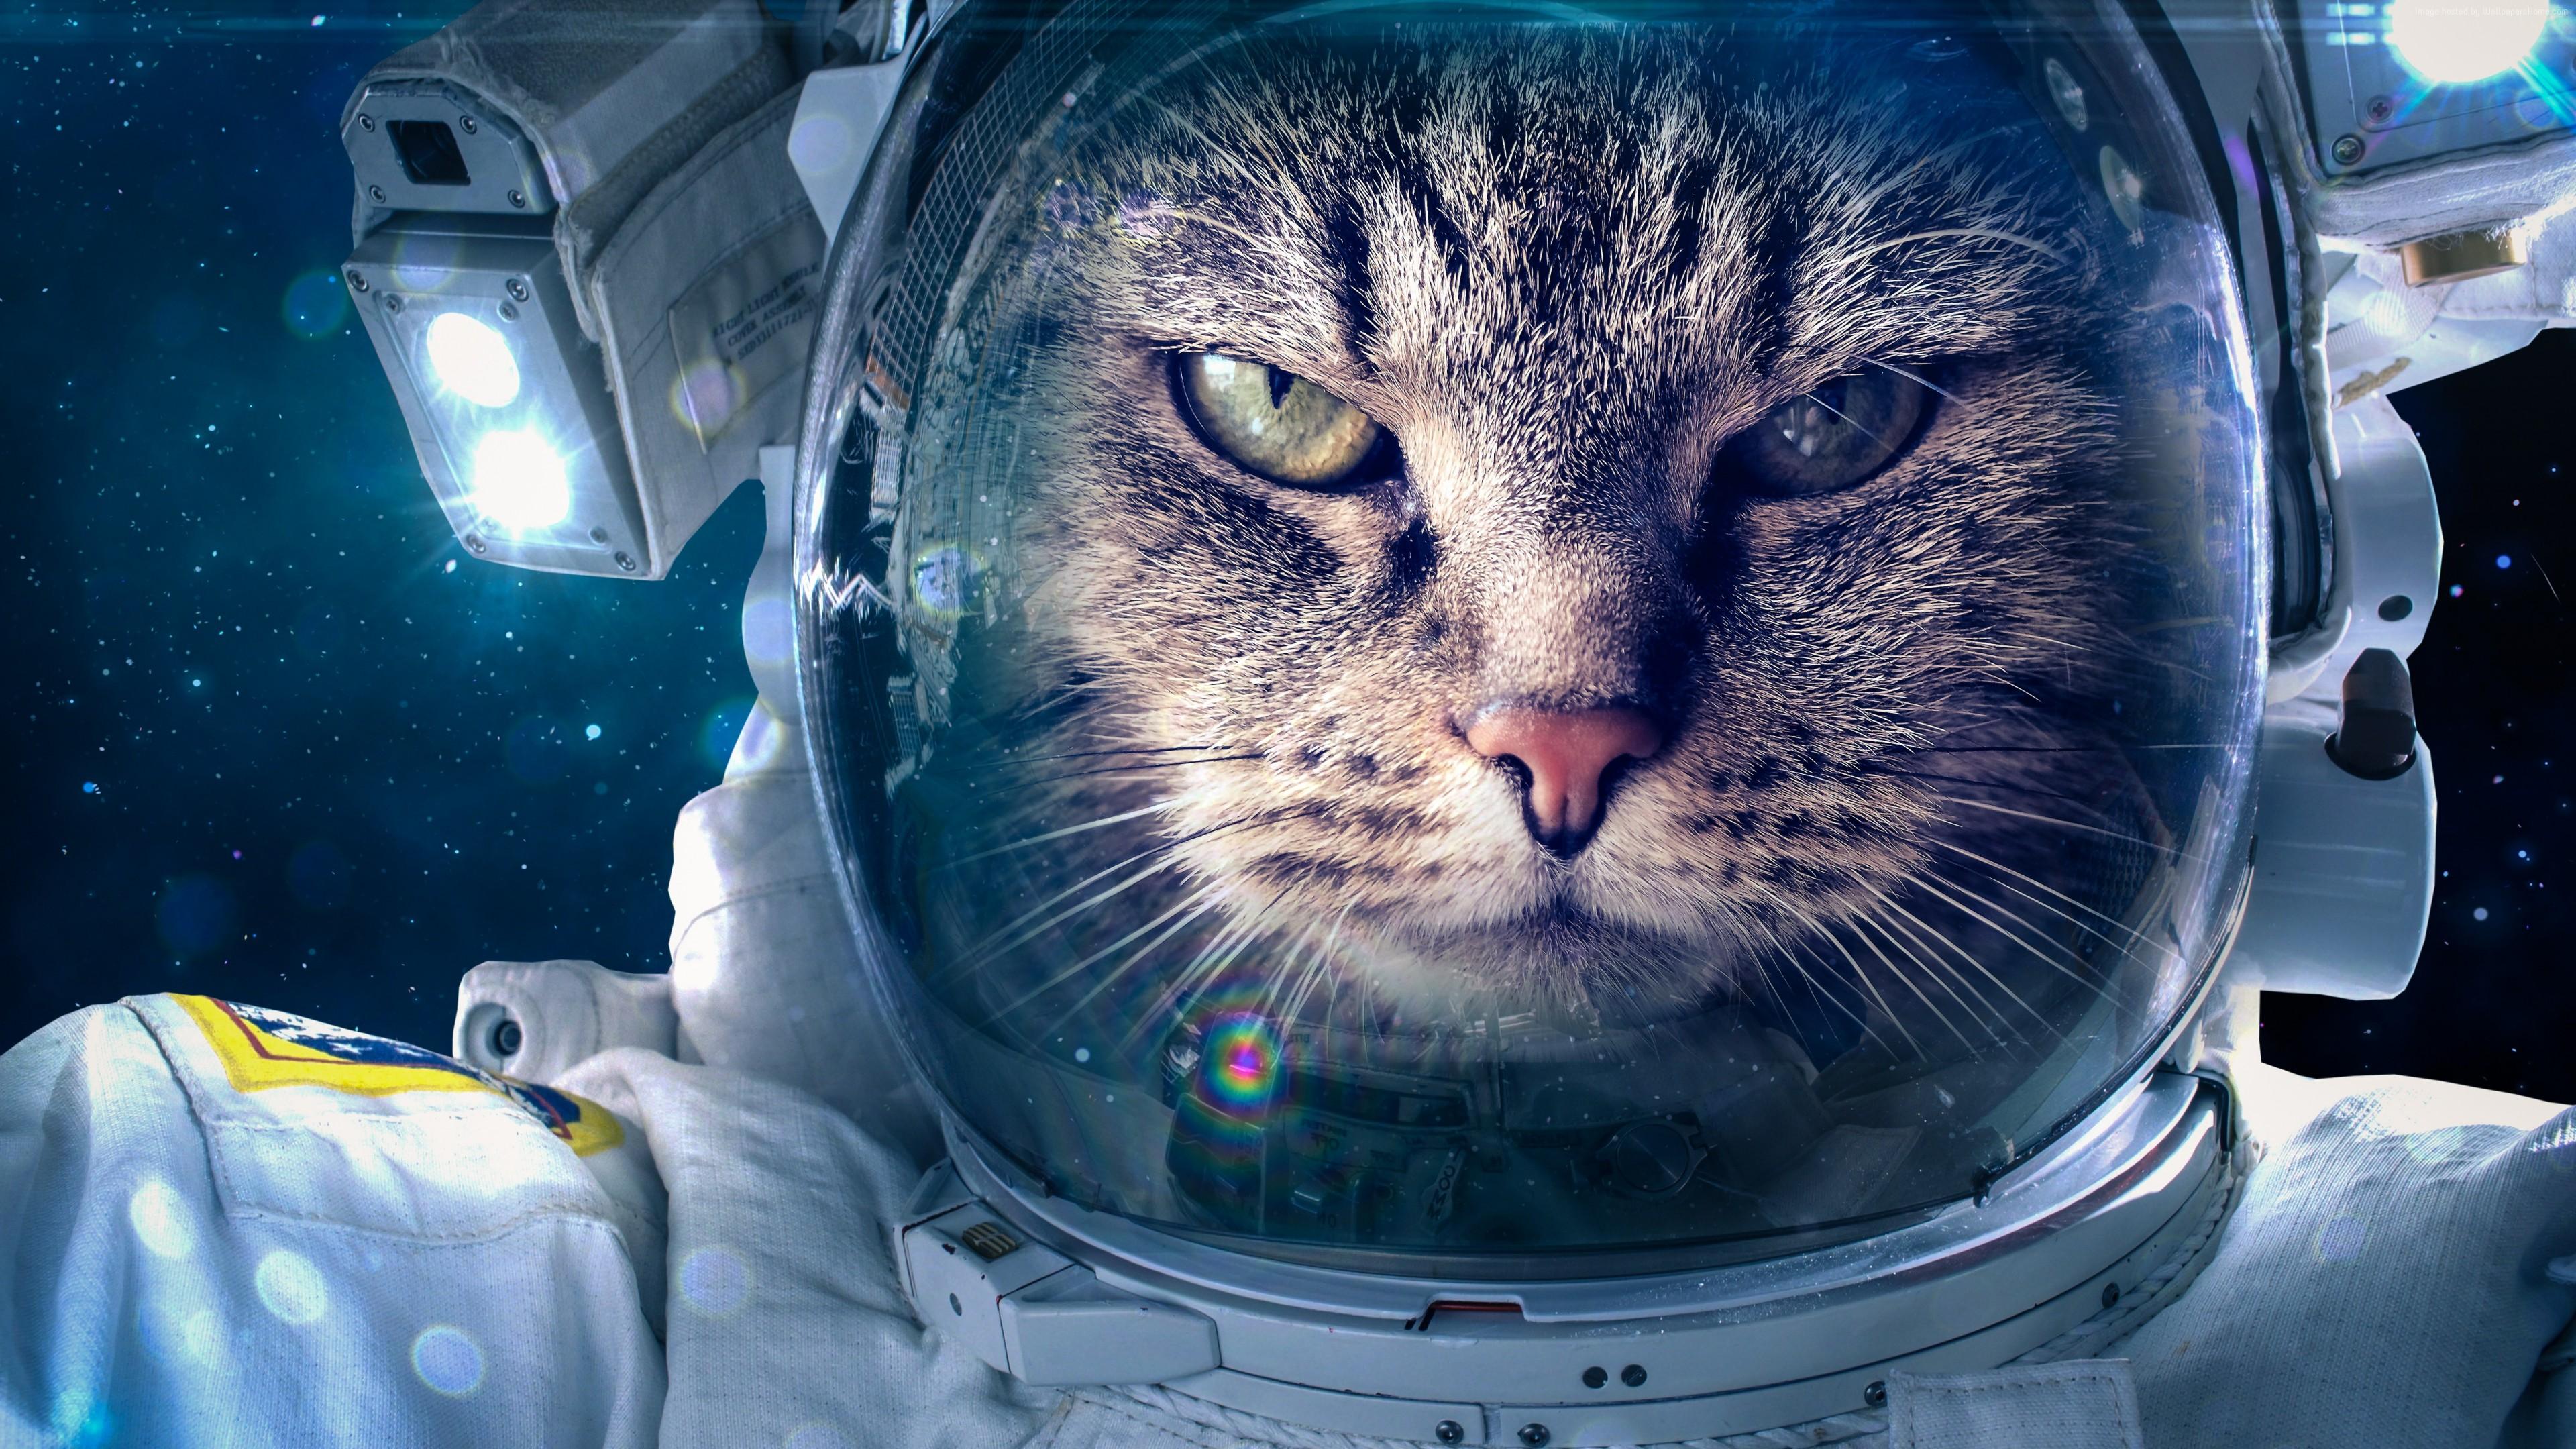 Stock Images Astronaut Funny Animals Cat 4k 5k Stock Images Wallpaper Download High Resolution 4k Wallpaper